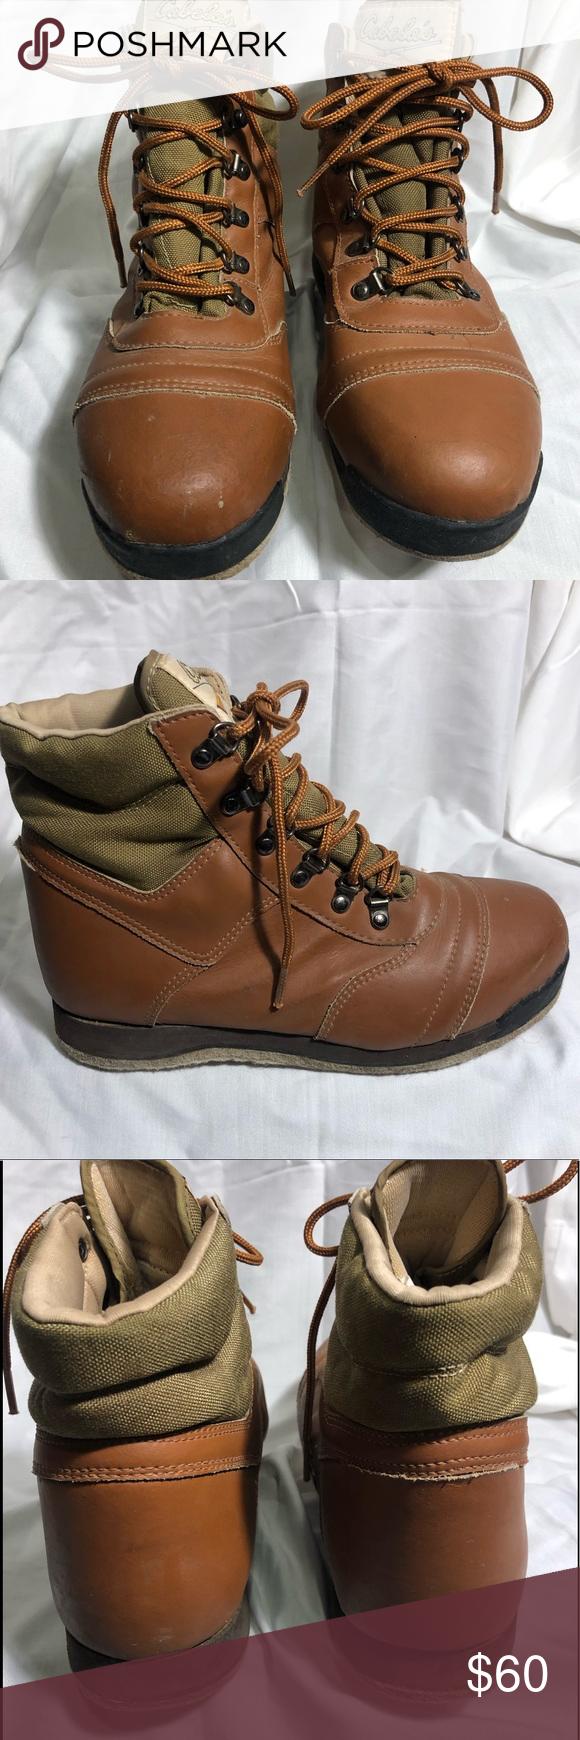 Cabelas Roofing Boots Size 8 Boots Cabelas Shoe Boots